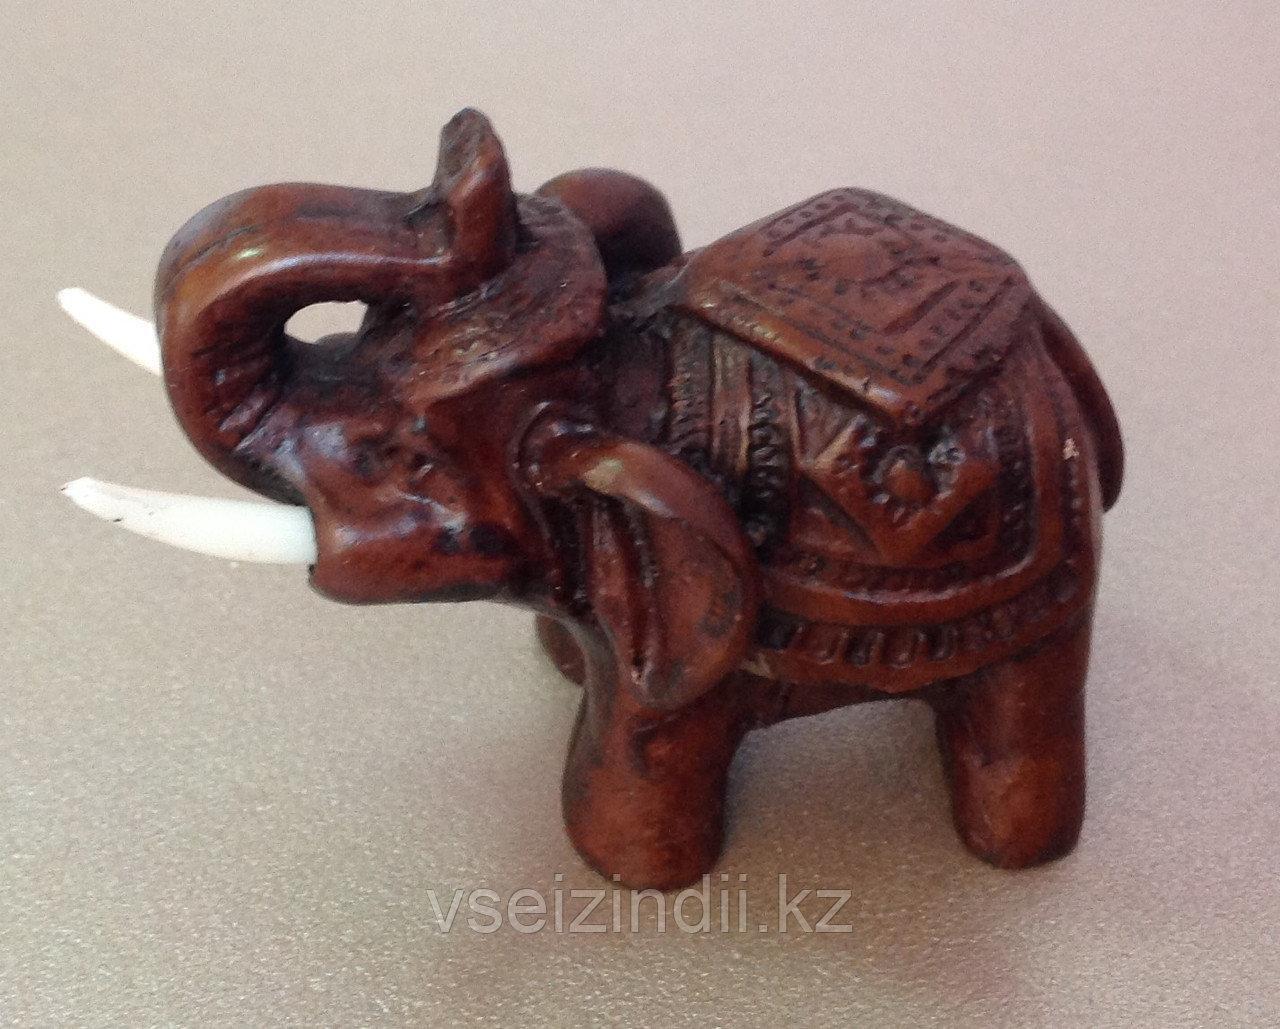 Слон тайский с бивнями - 3